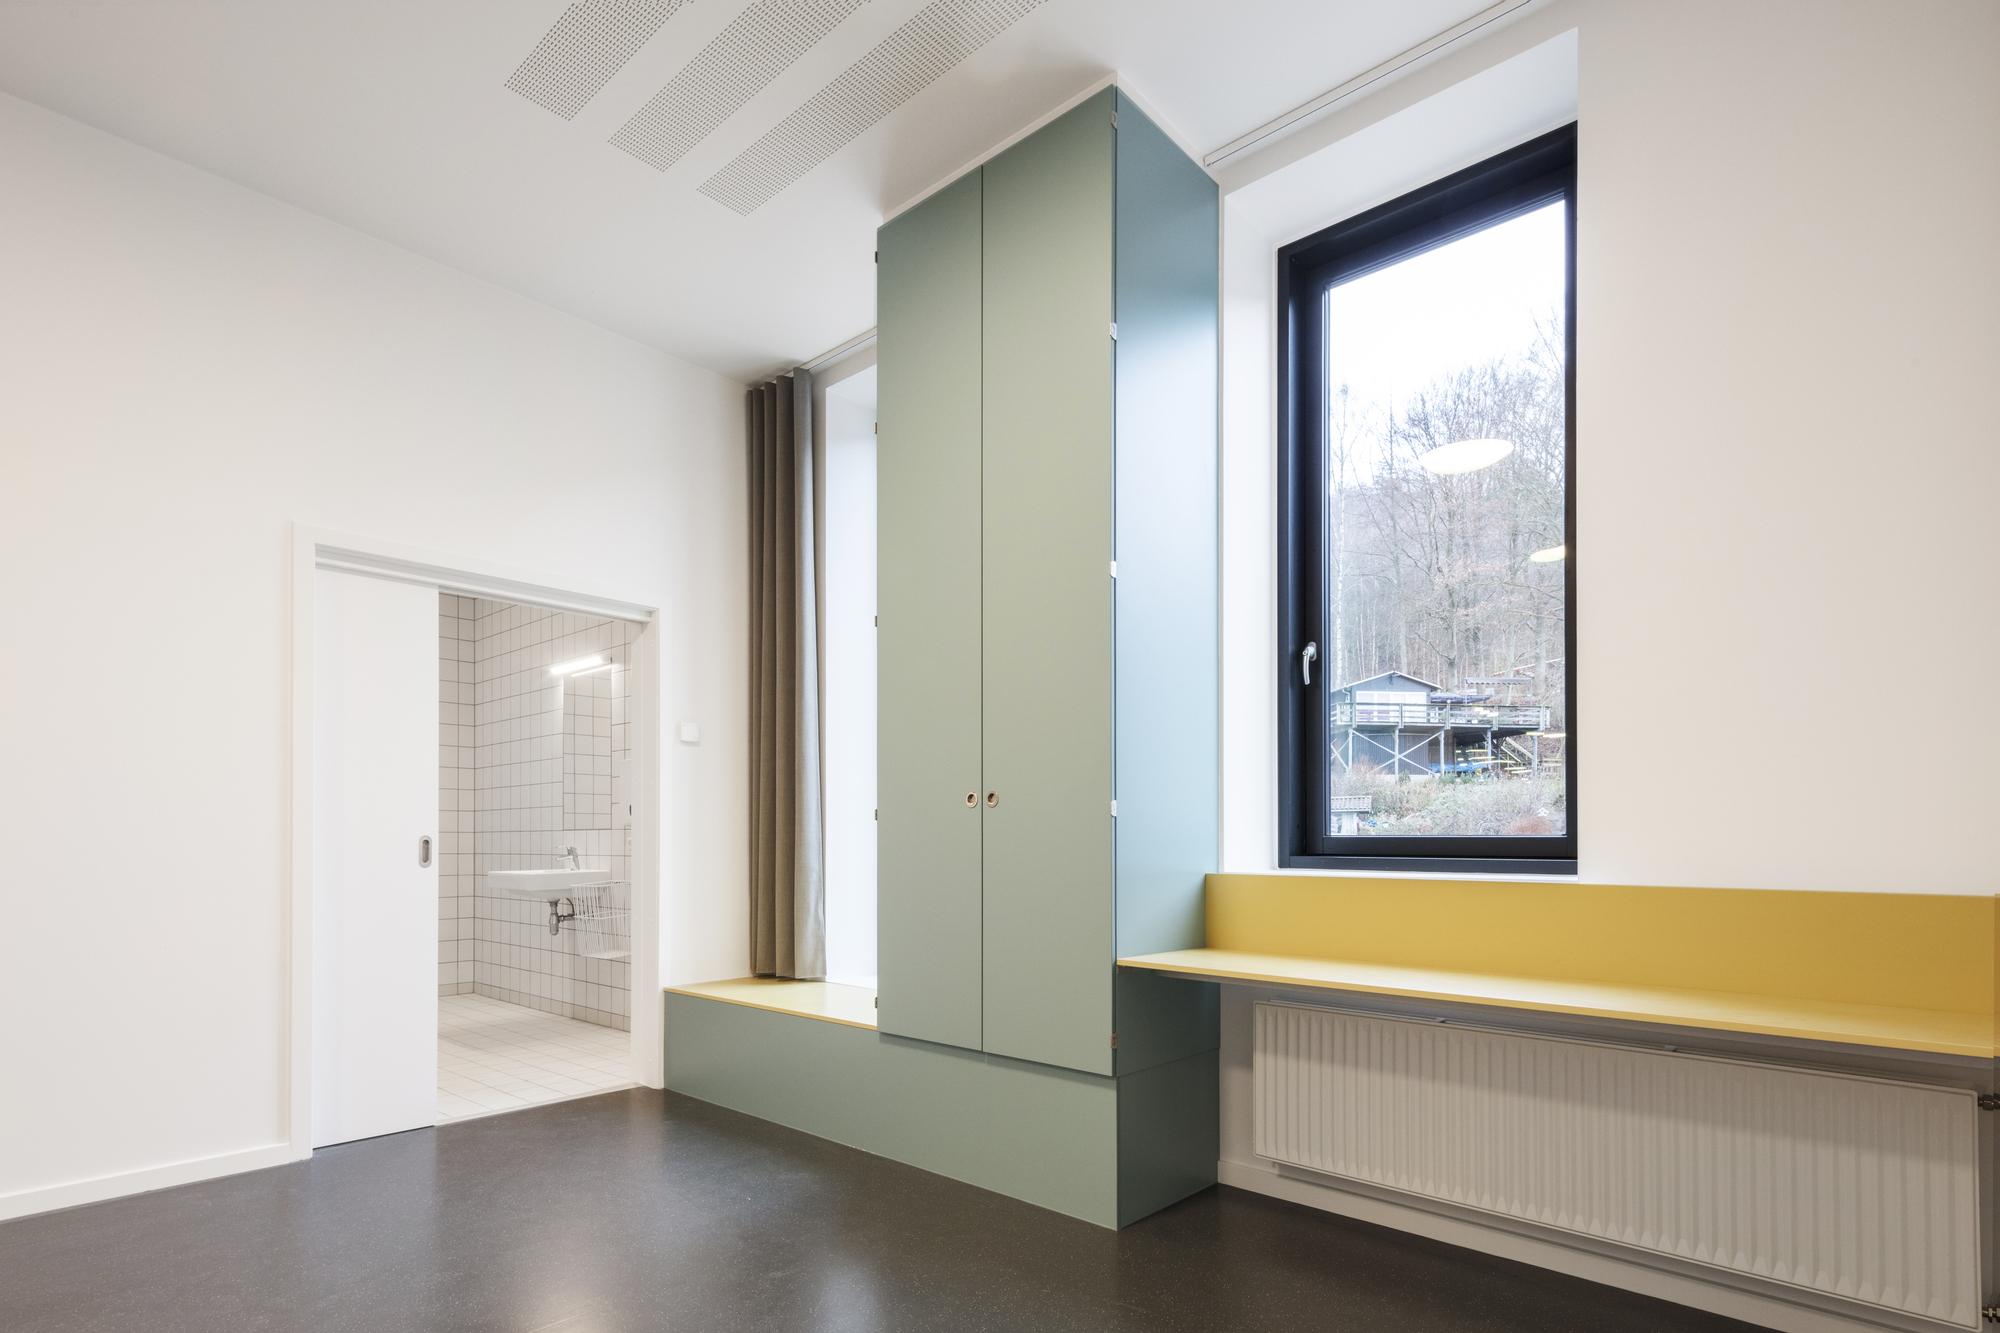 Psychiatric Hospital Room Design